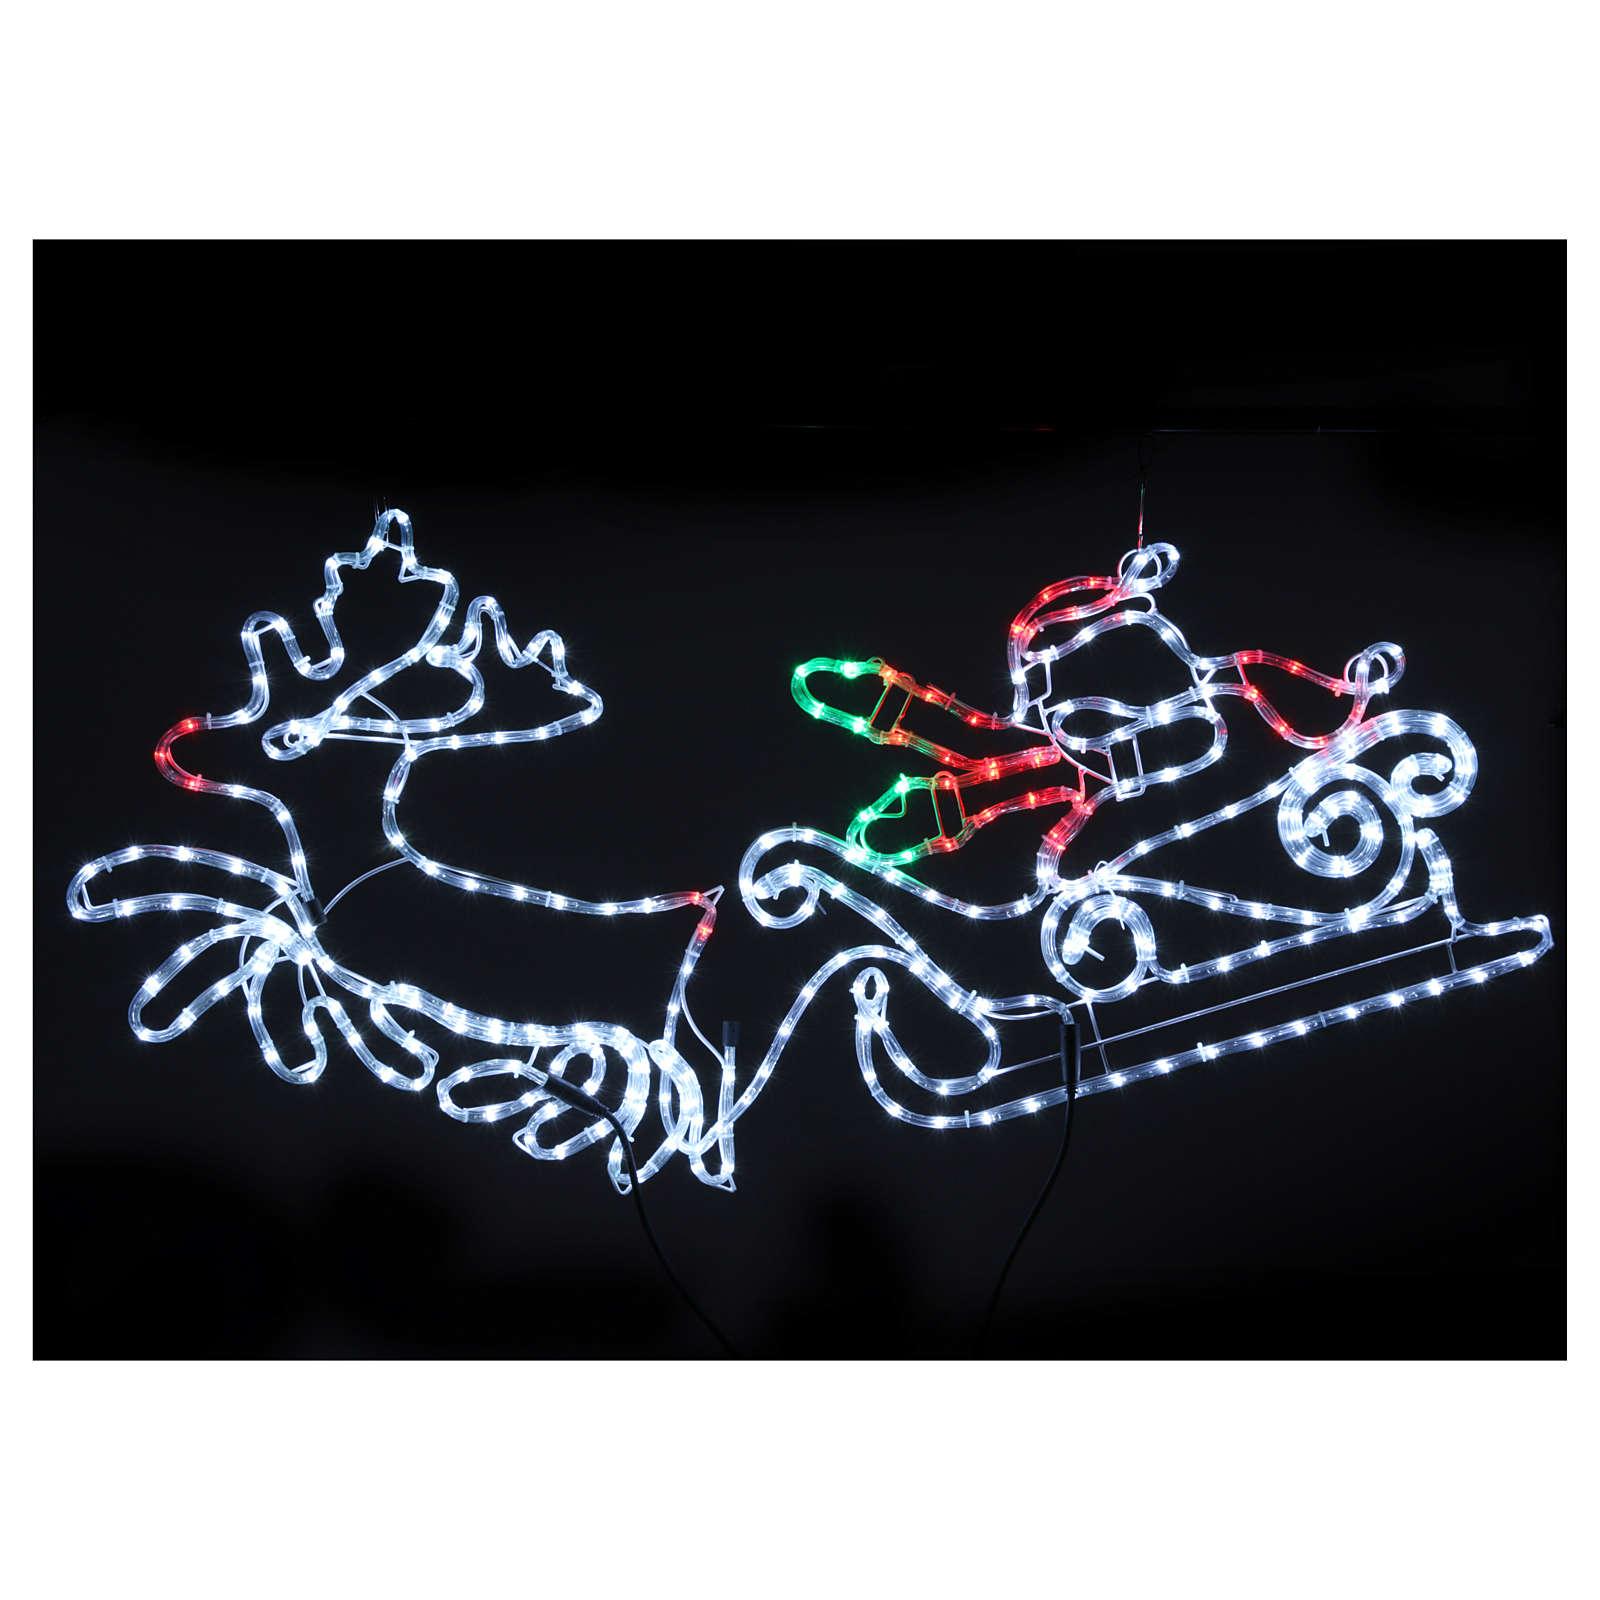 Luz navideña Papá Noel 312 LED interior exterior 3